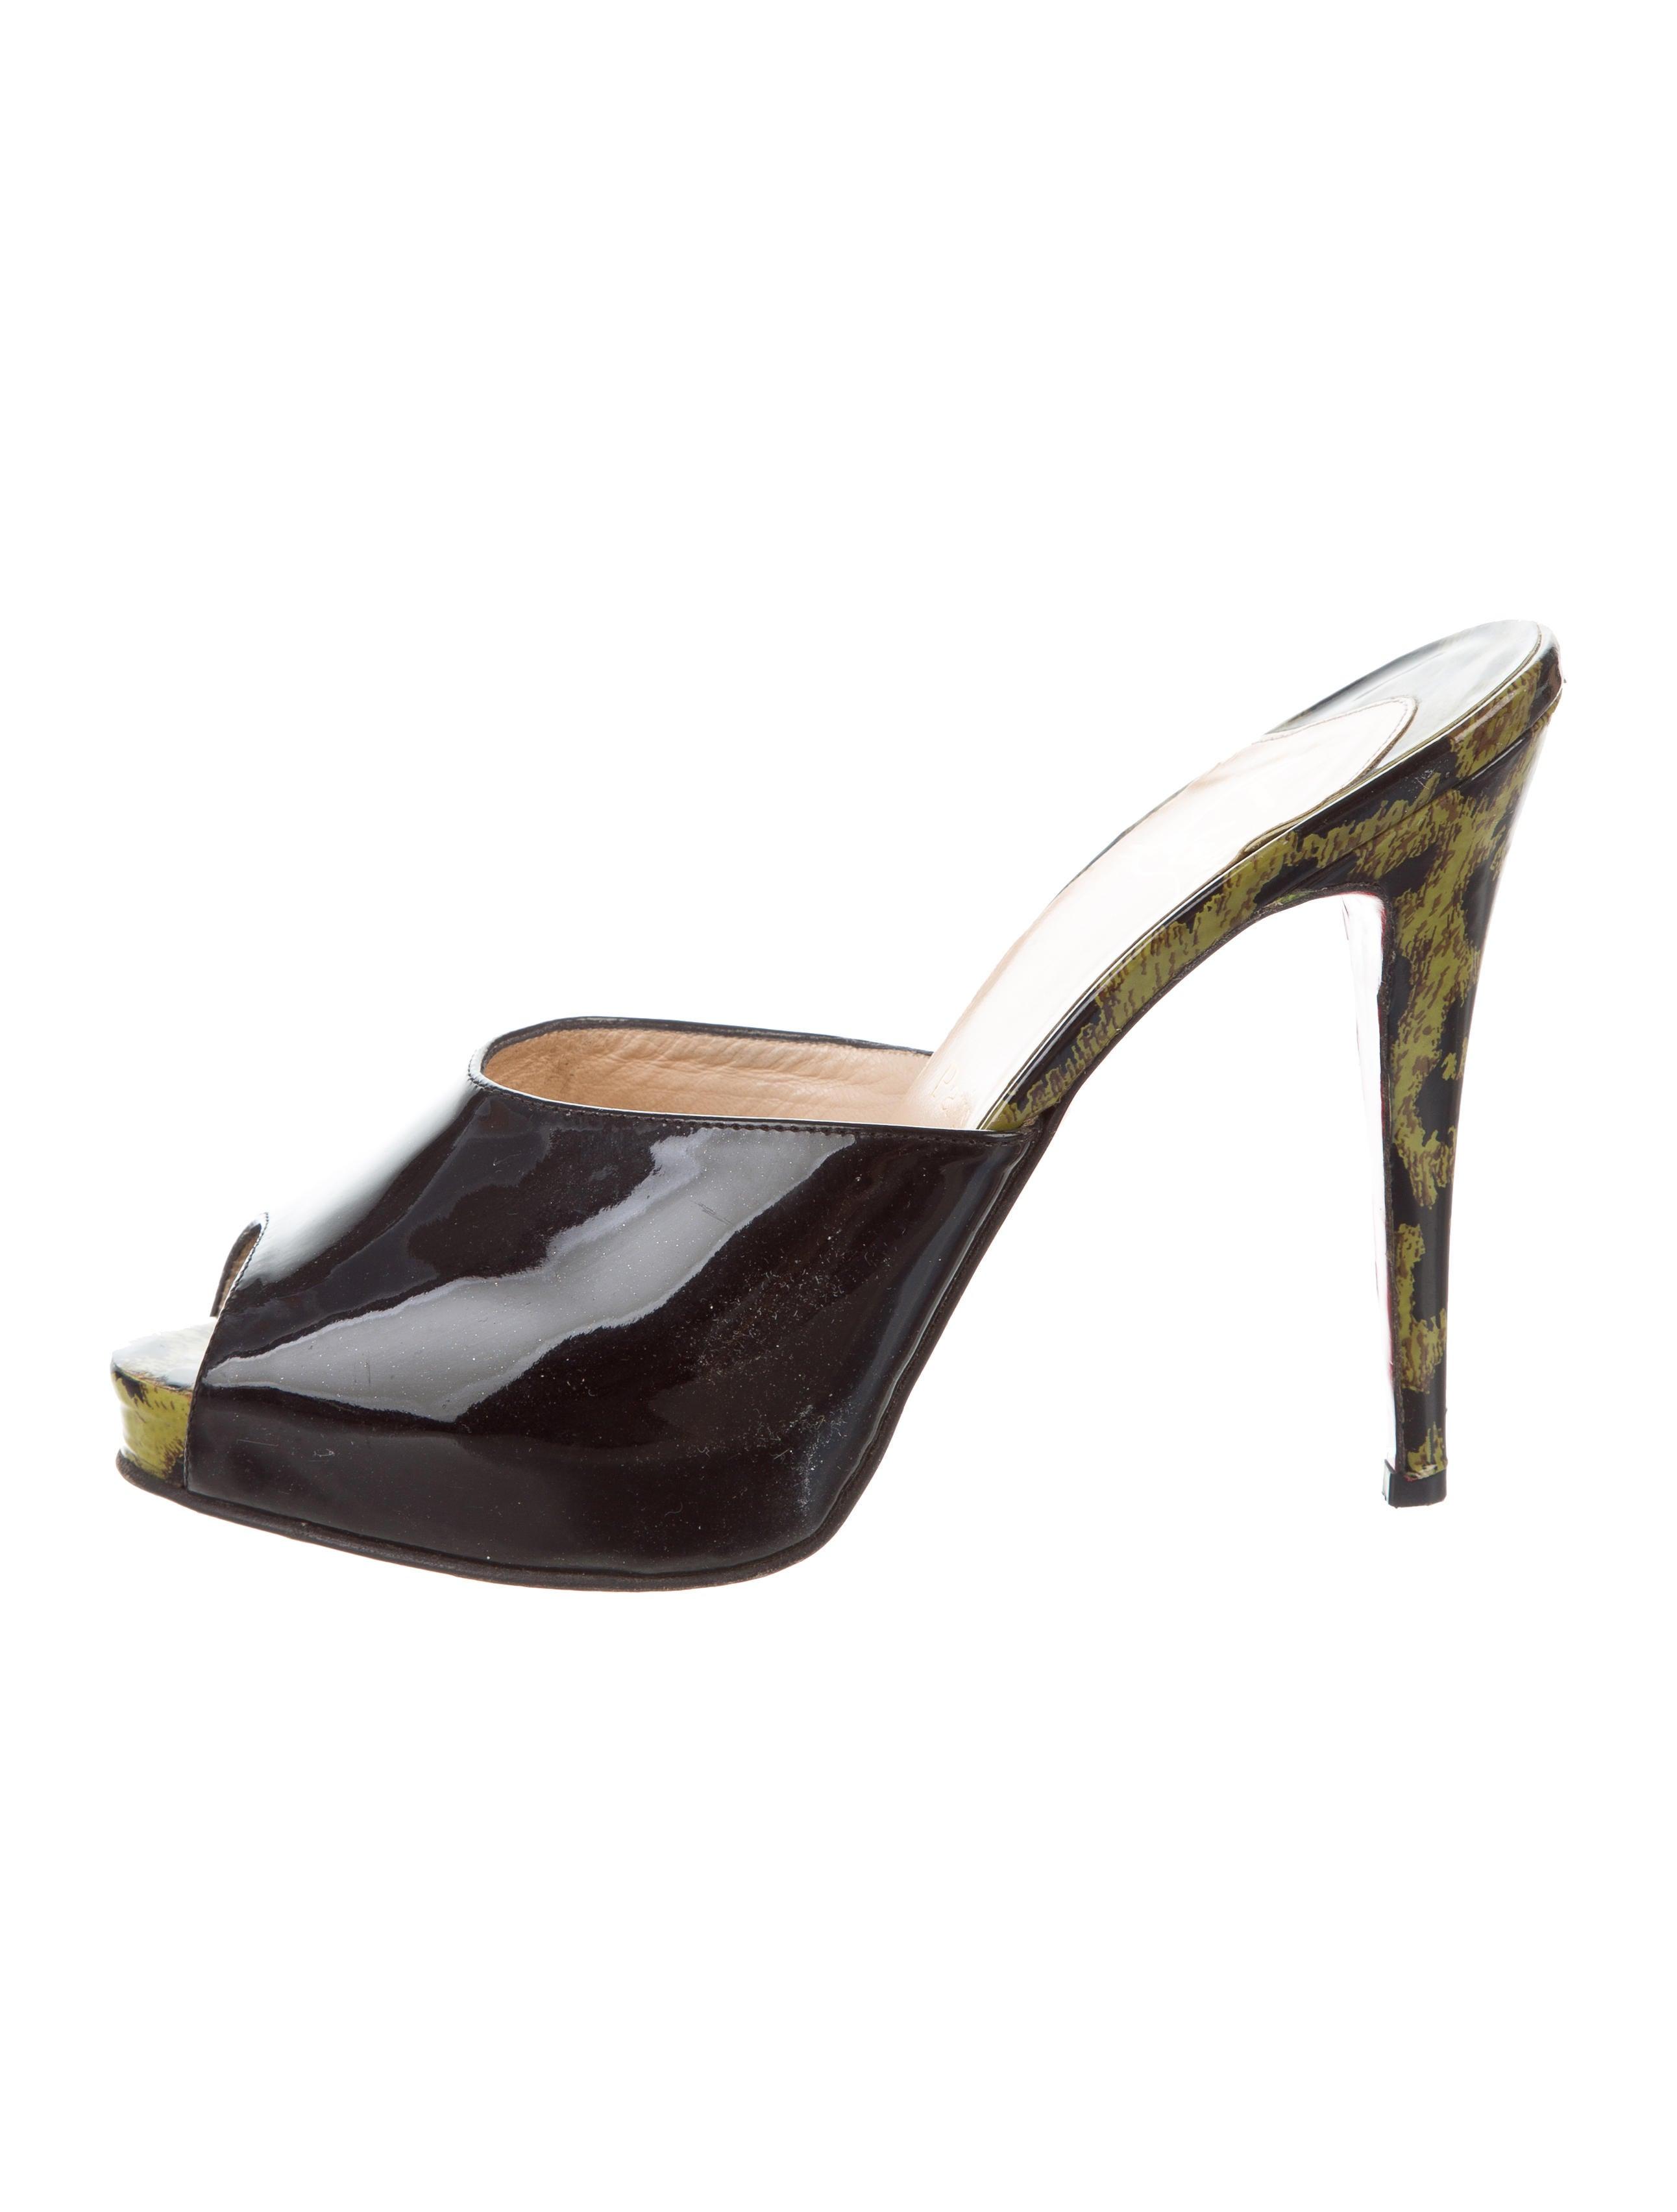 Christian Louboutin Patent Slide Sandals cheap sale visit new footlocker pictures cheap online K8R4E